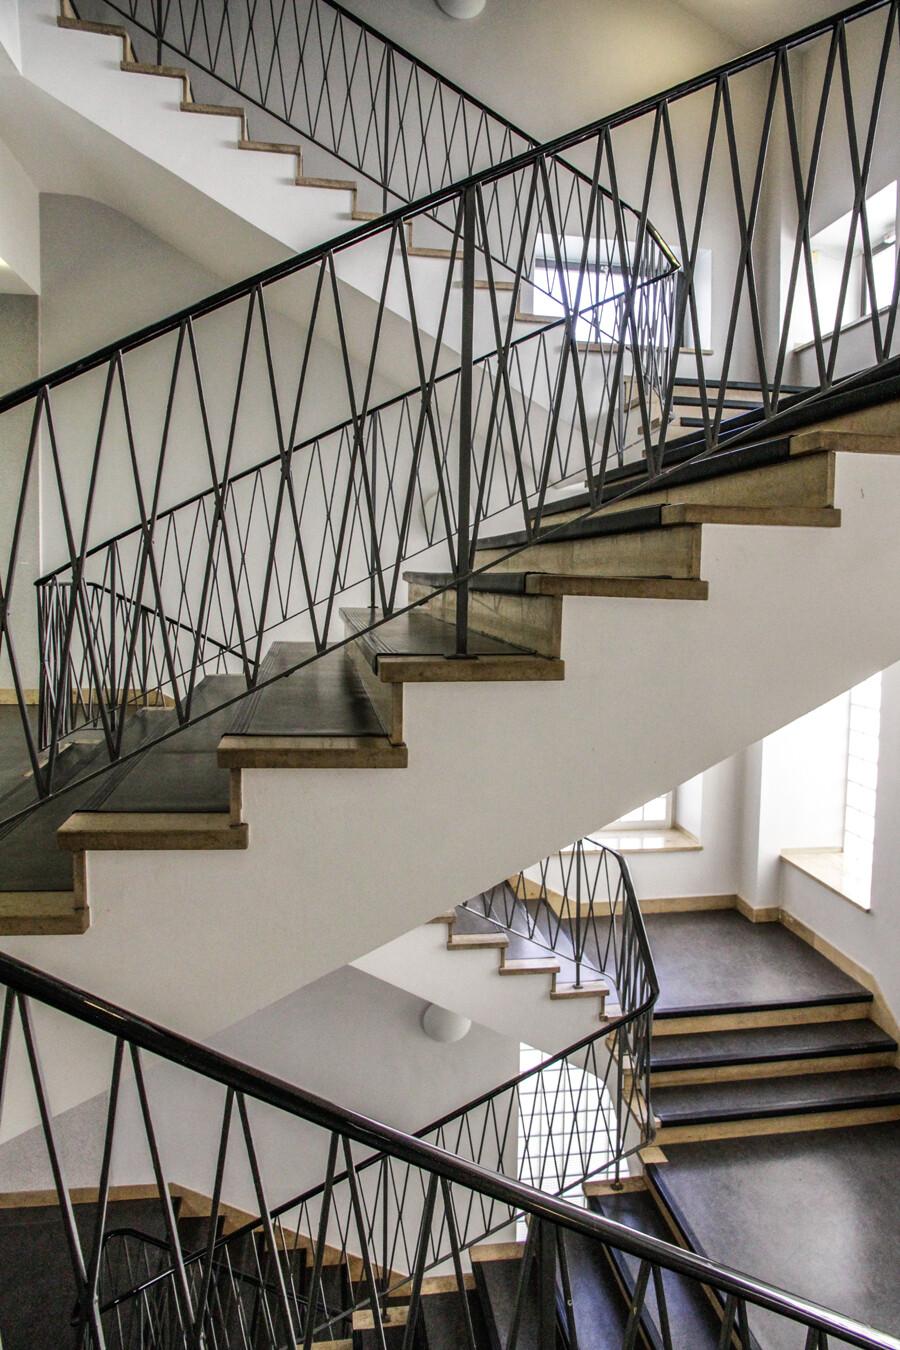 semperhaus-treppenhaus-architekturfotografie-hamburg-tom-koehler